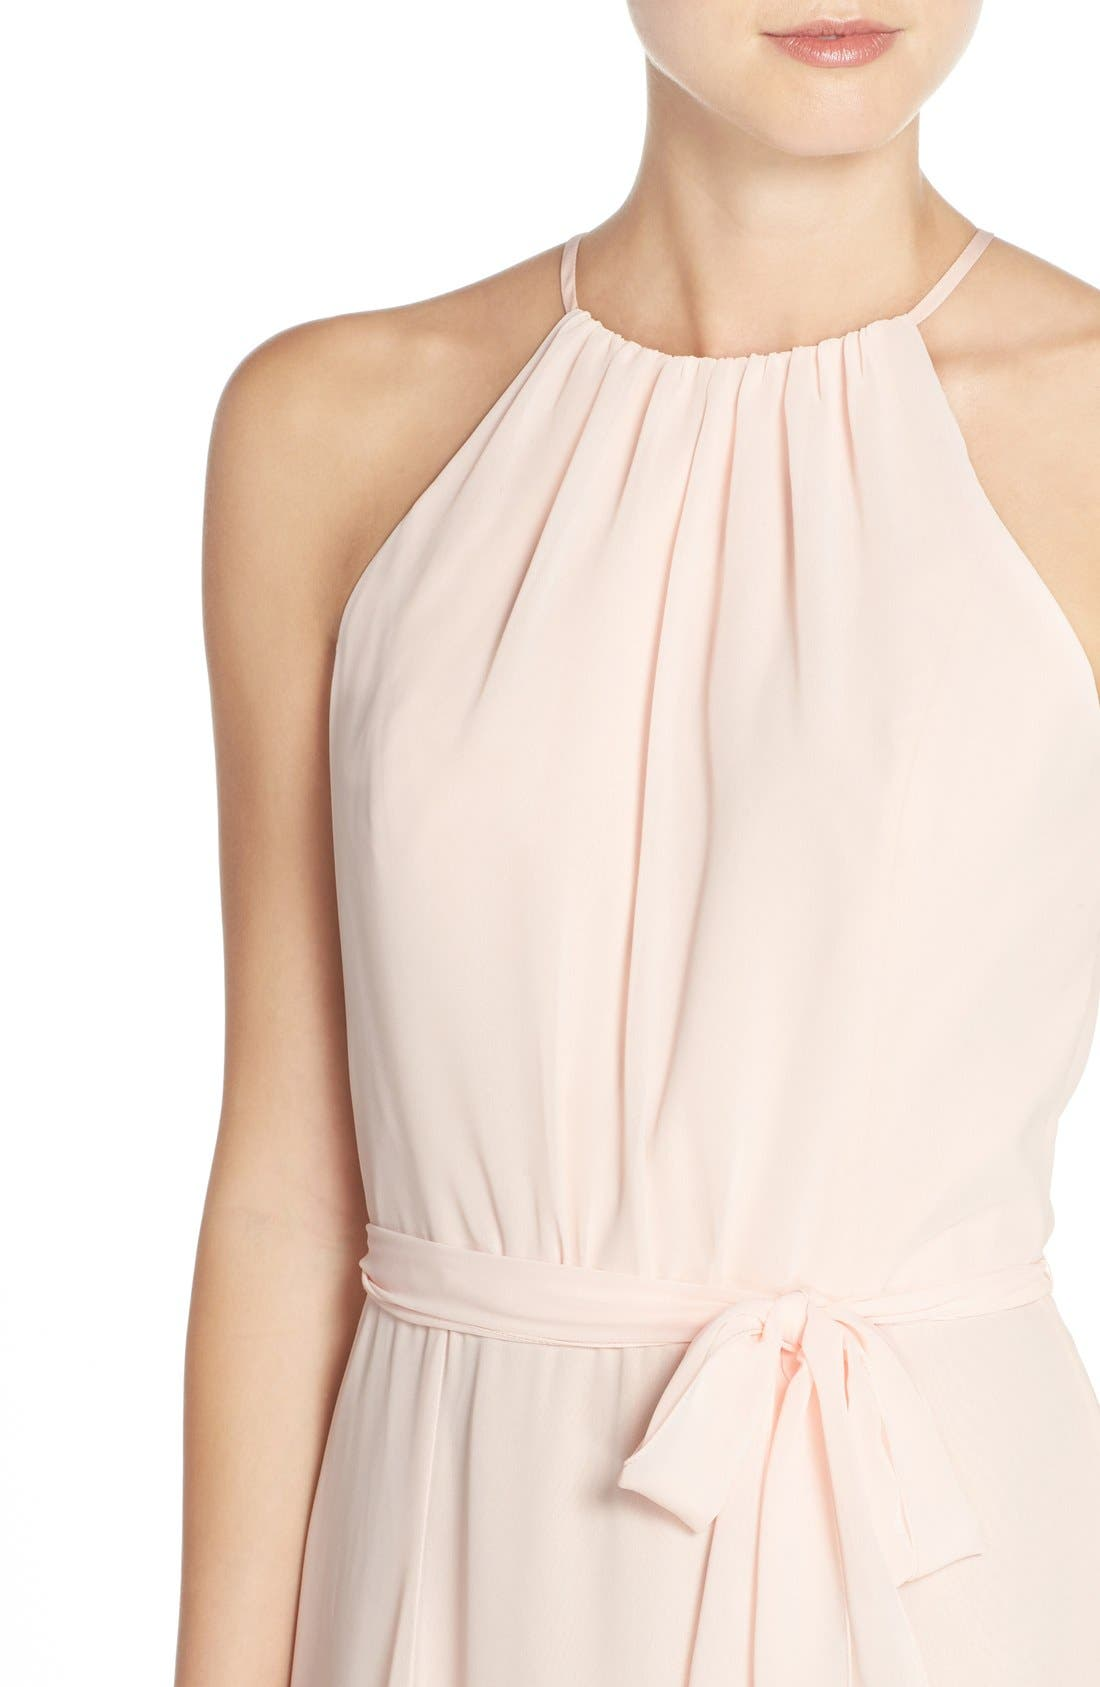 'Delaney' Belted A-Line Chiffon Halter Dress,                             Alternate thumbnail 10, color,